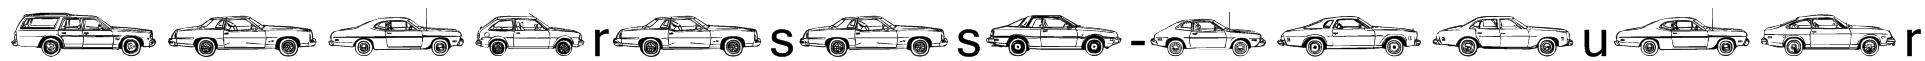 OilCrisisB-Regular Font